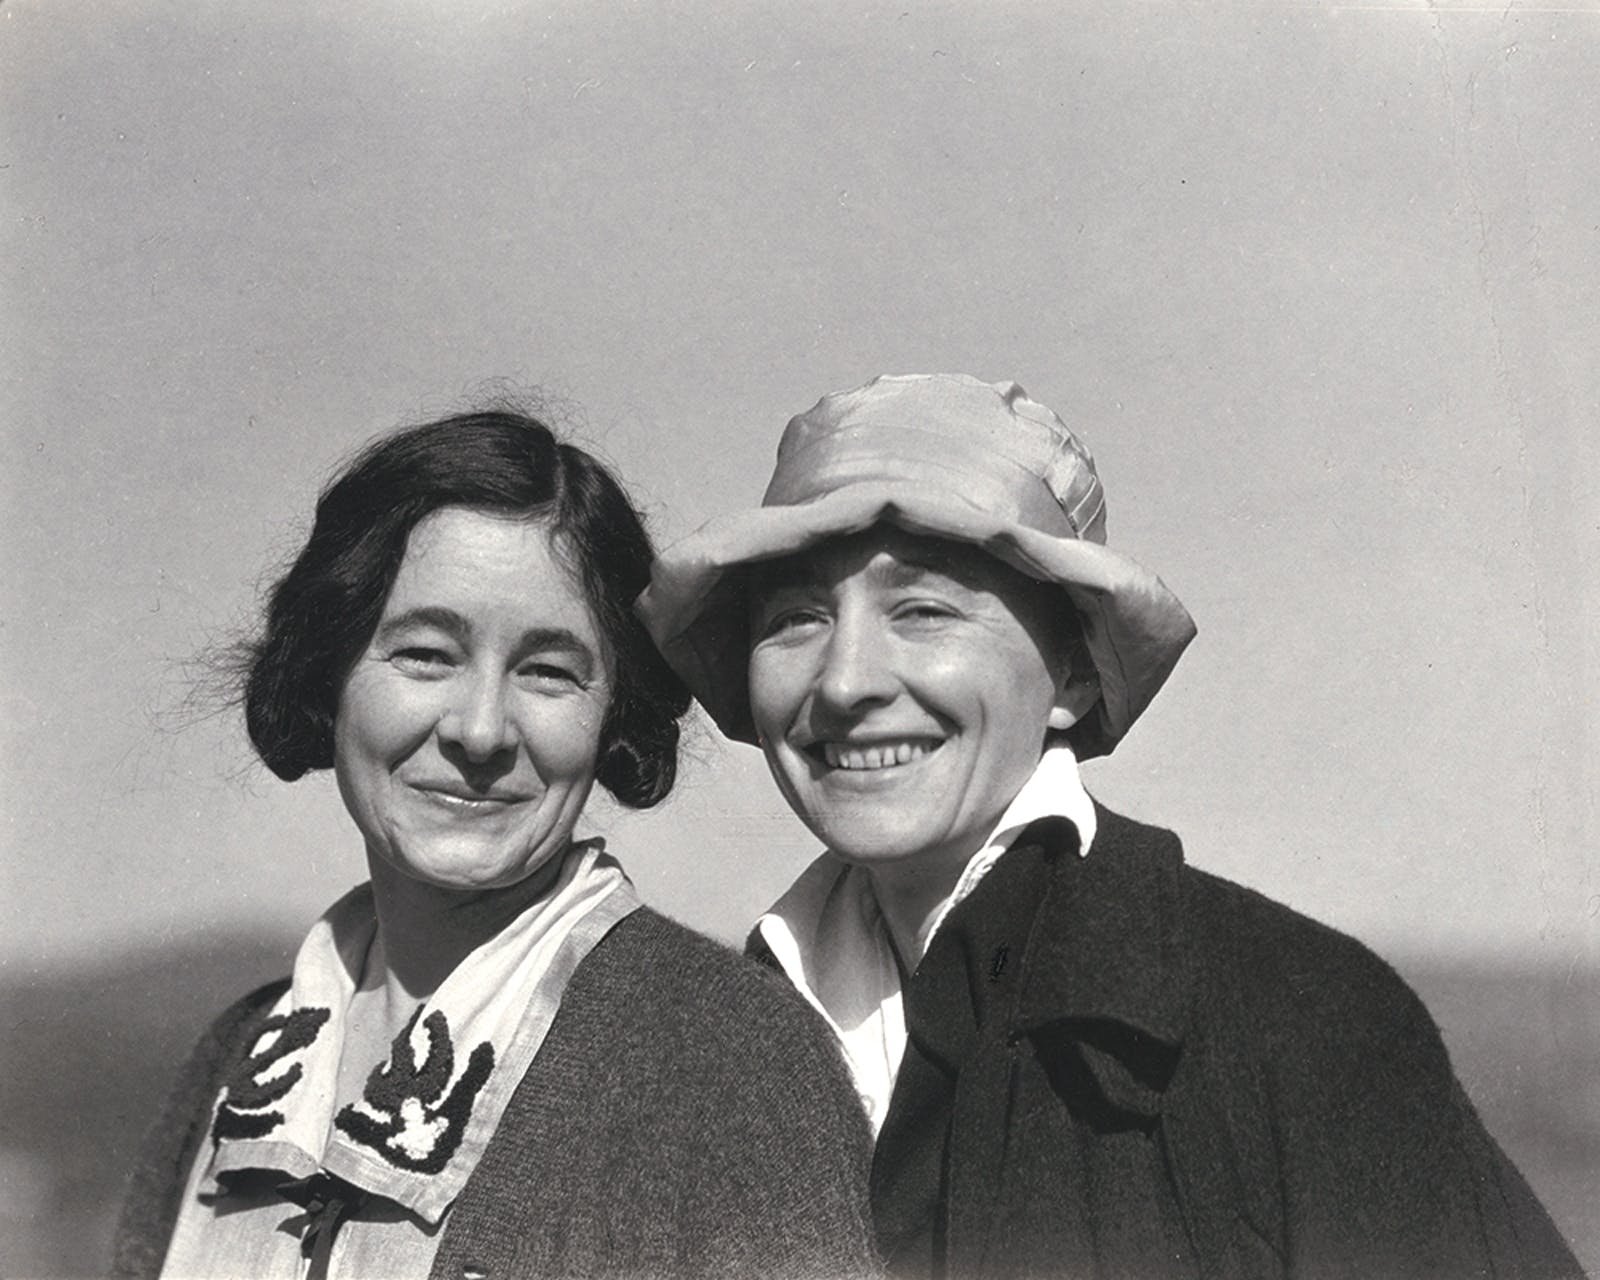 Ida and Georgia O'Keeffe smiling together